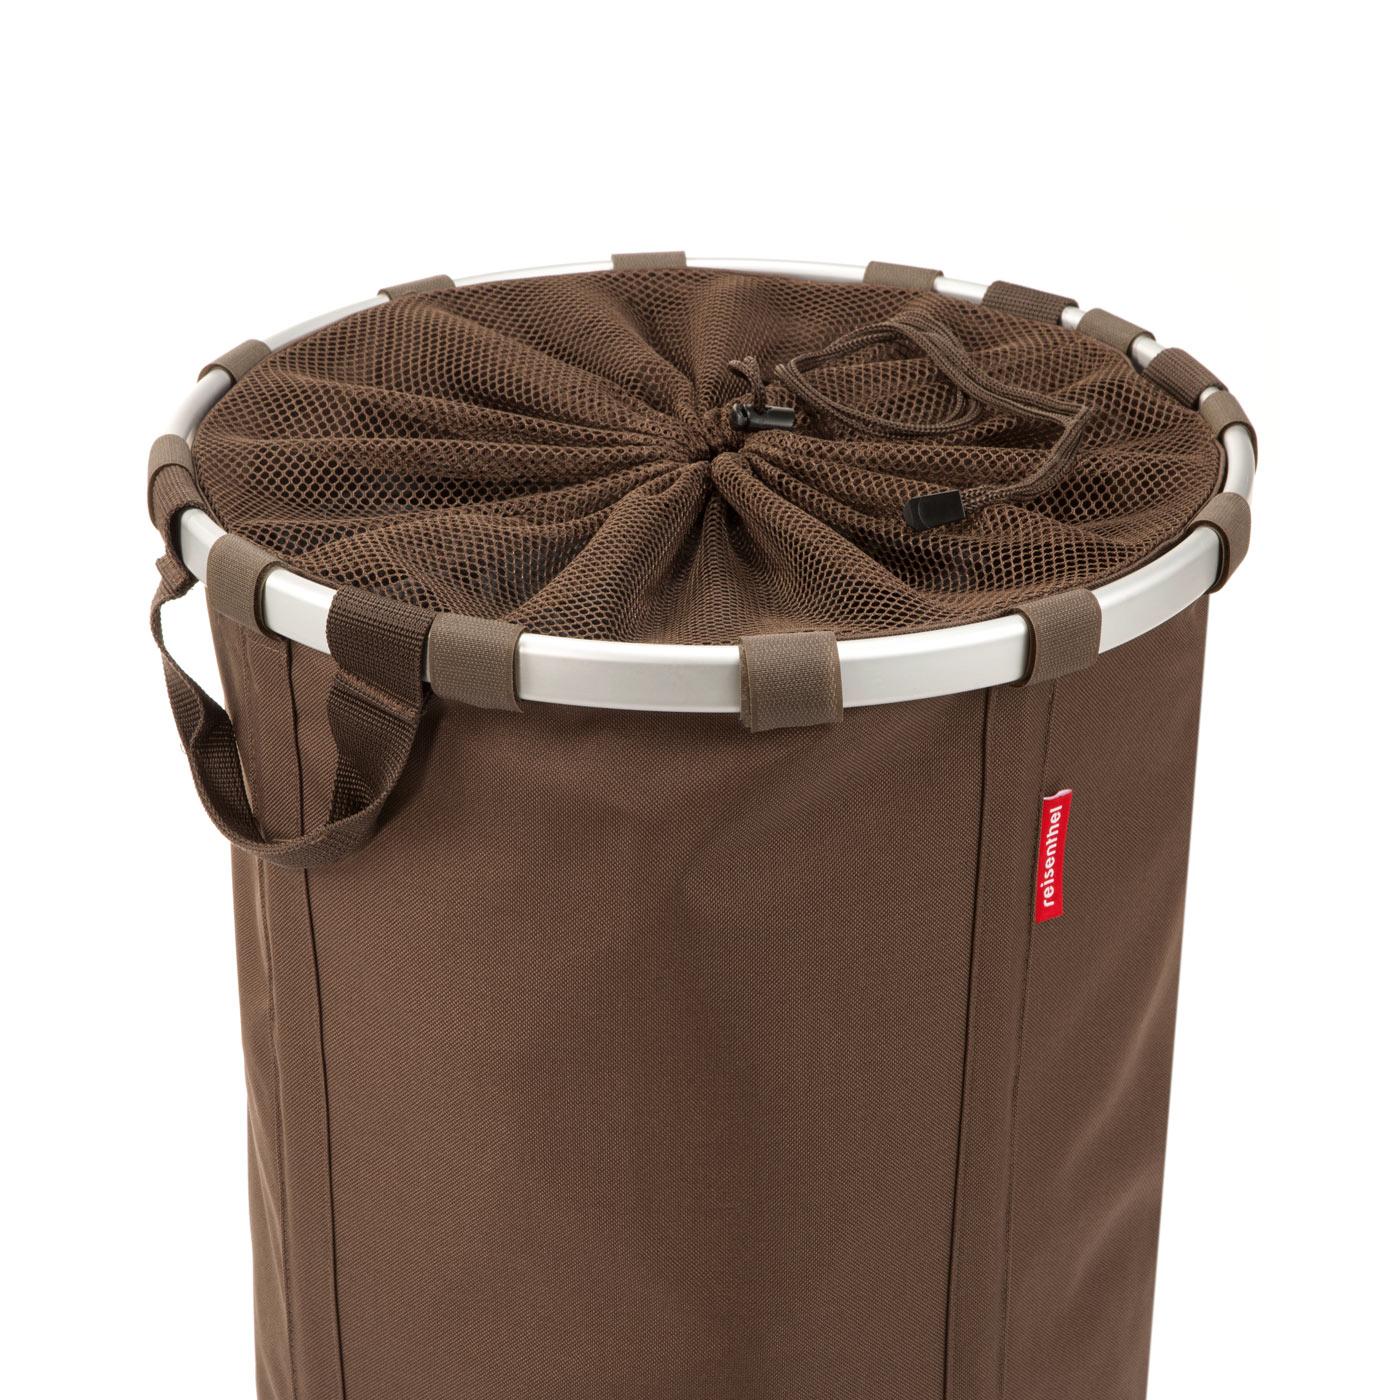 tvattkorg-mocha2-design-heminredning-badrum-brunnsboden-NJ6008